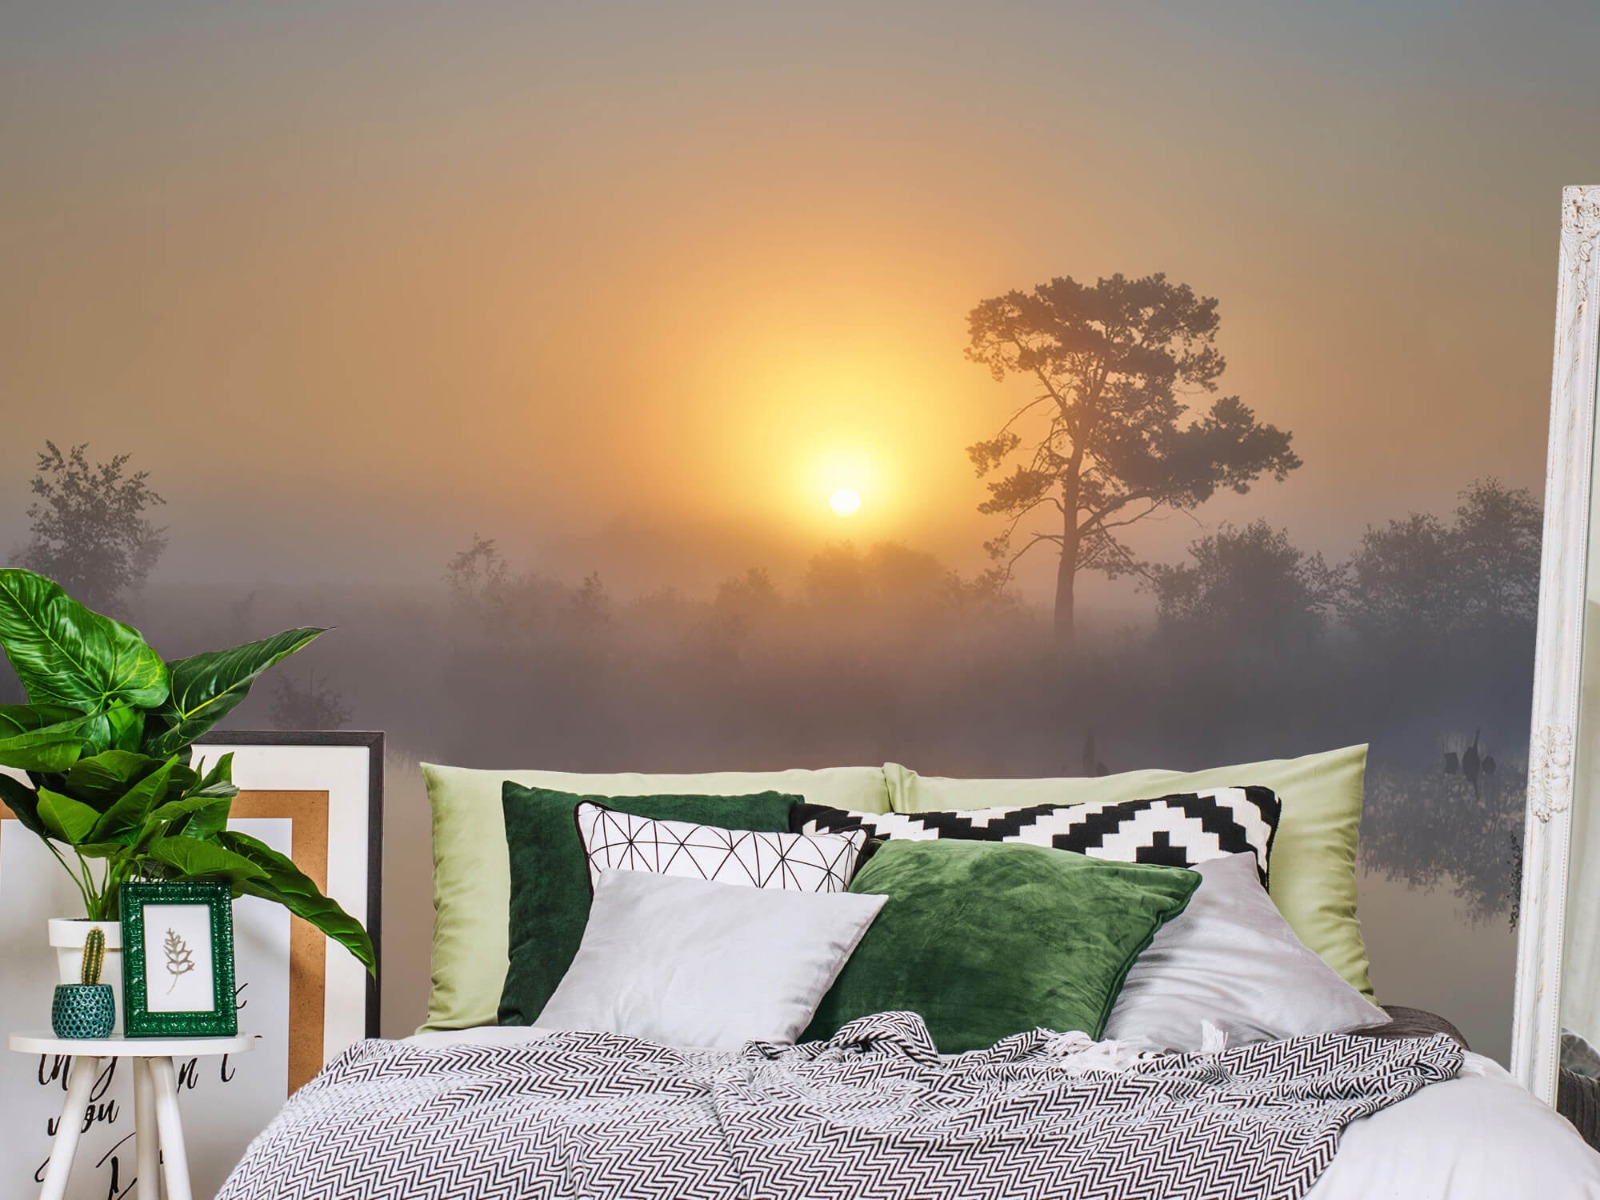 Natuur - Mistige zonsopkomst 13